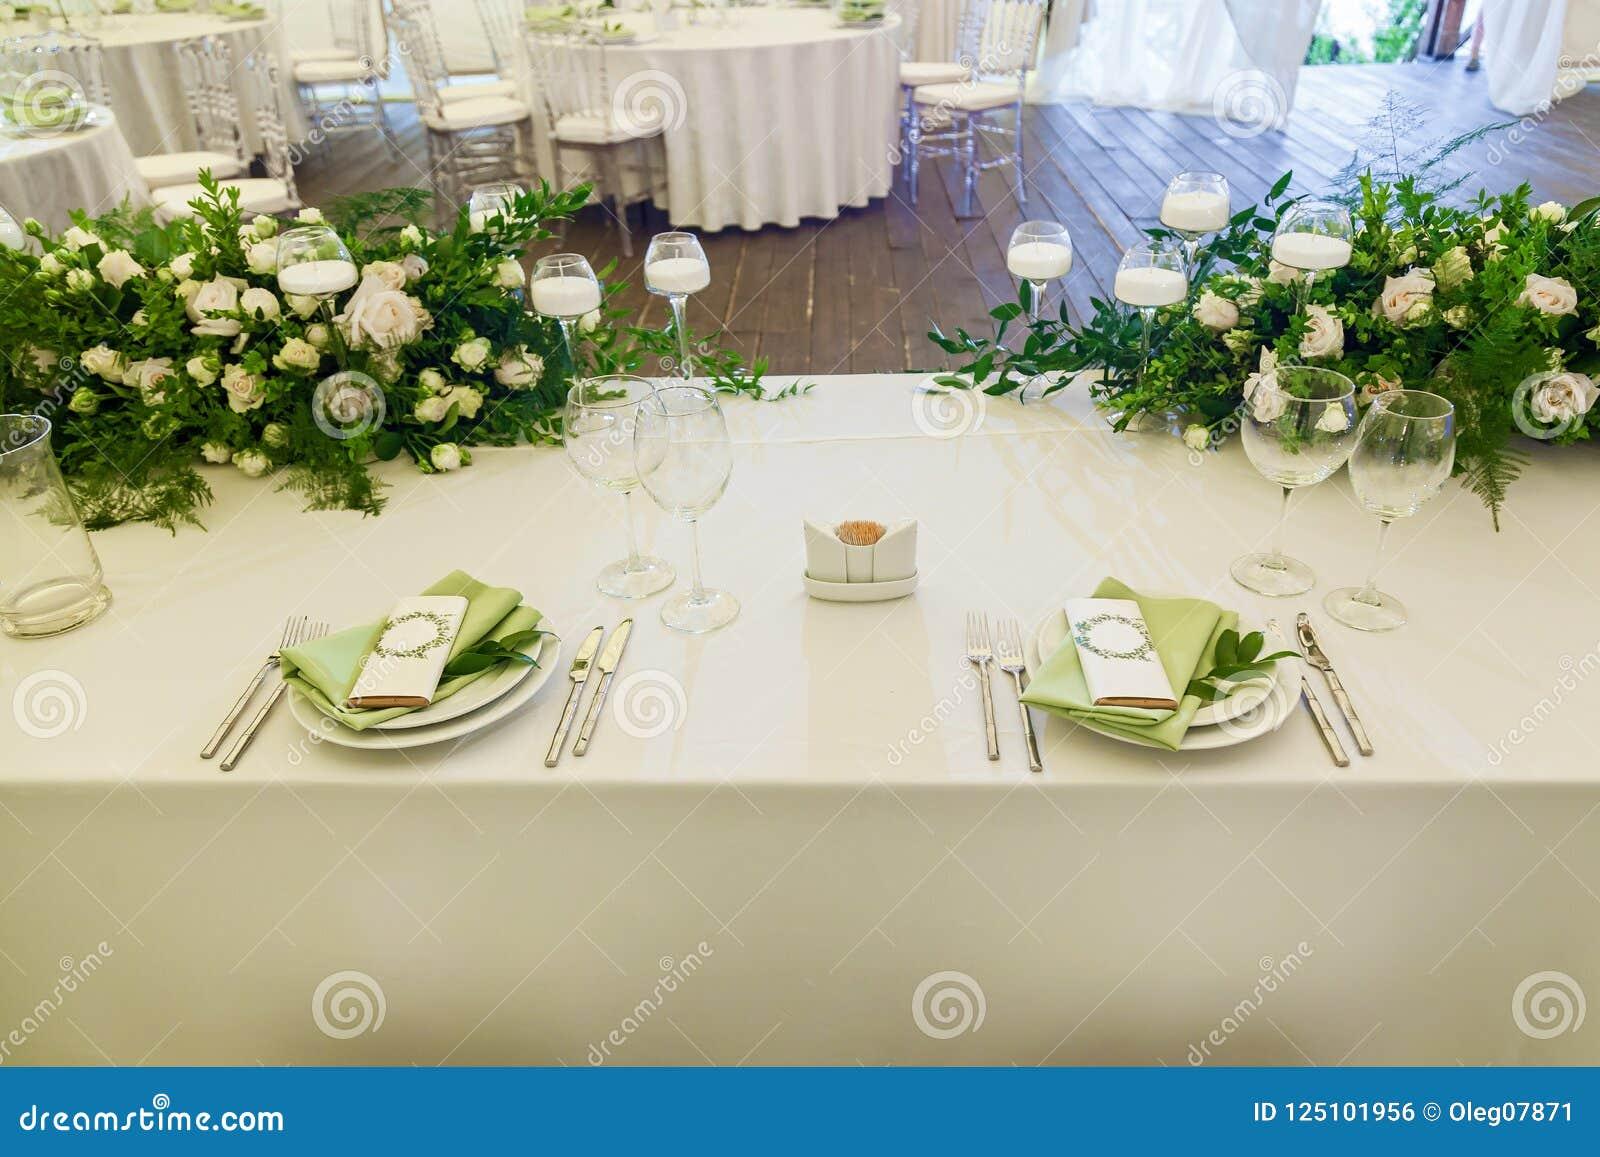 Decorating Flowers With A Wedding Celebration Stock Photo Image Of